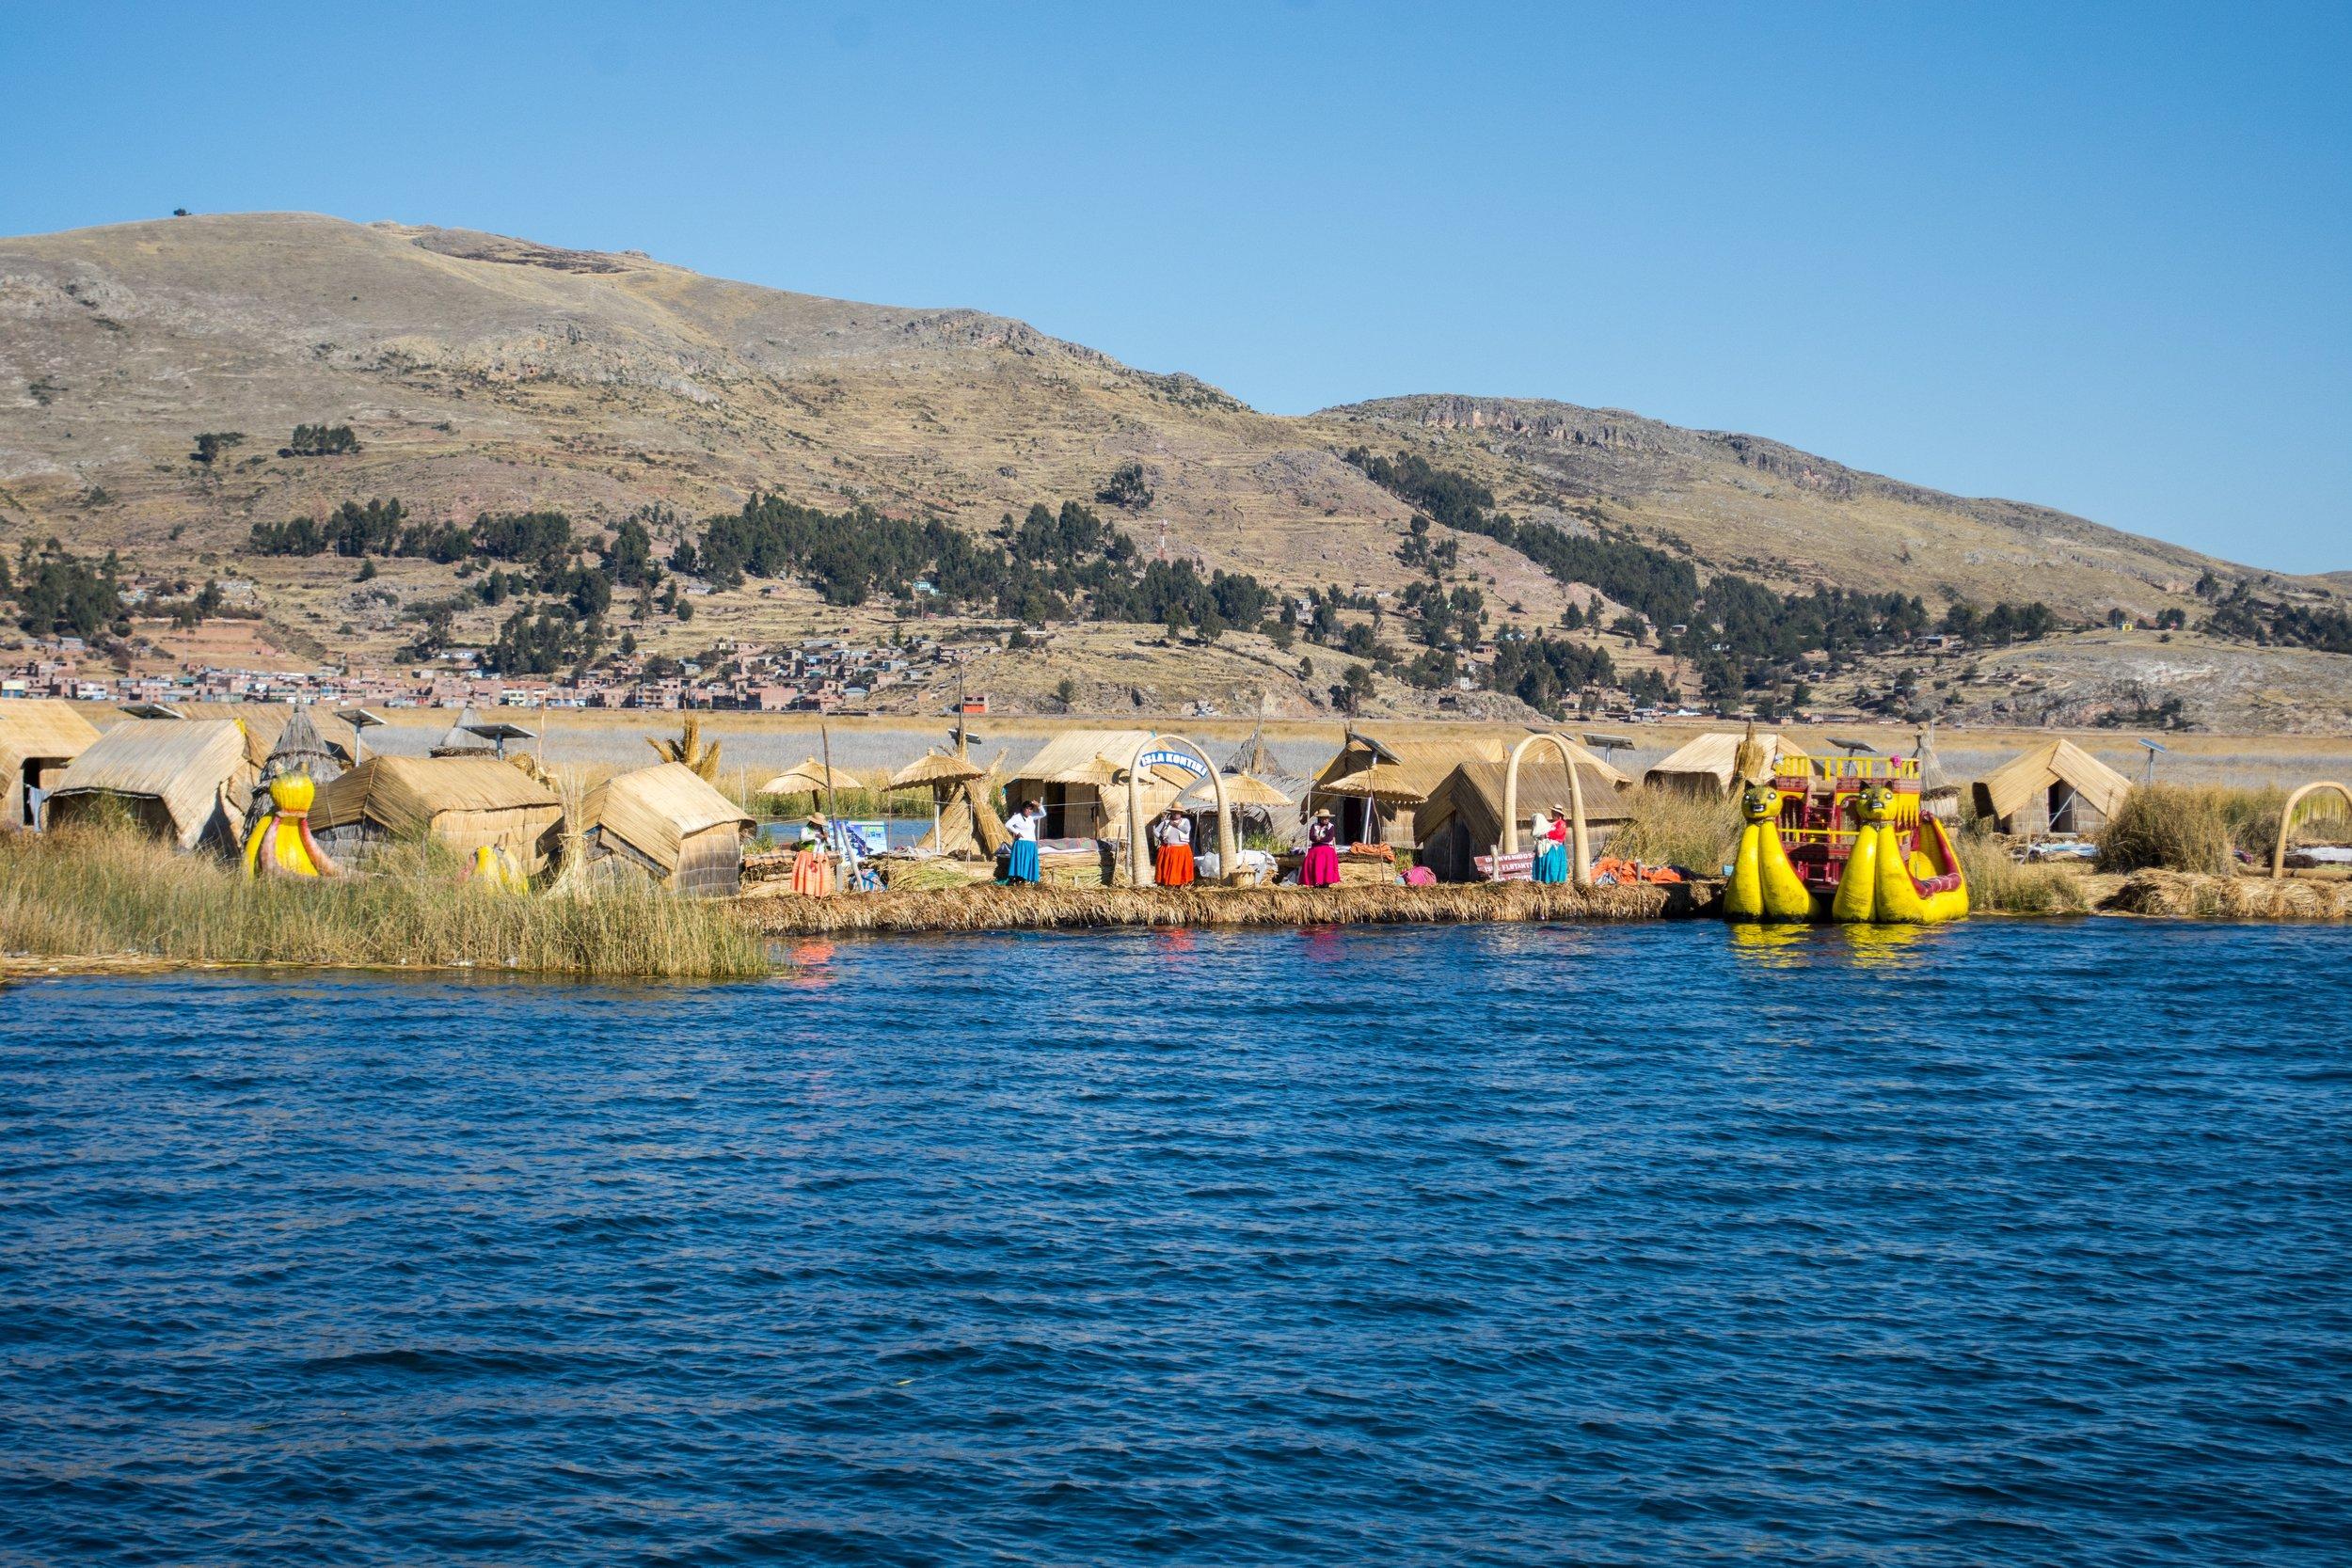 Uros Island in Lake Titicaca